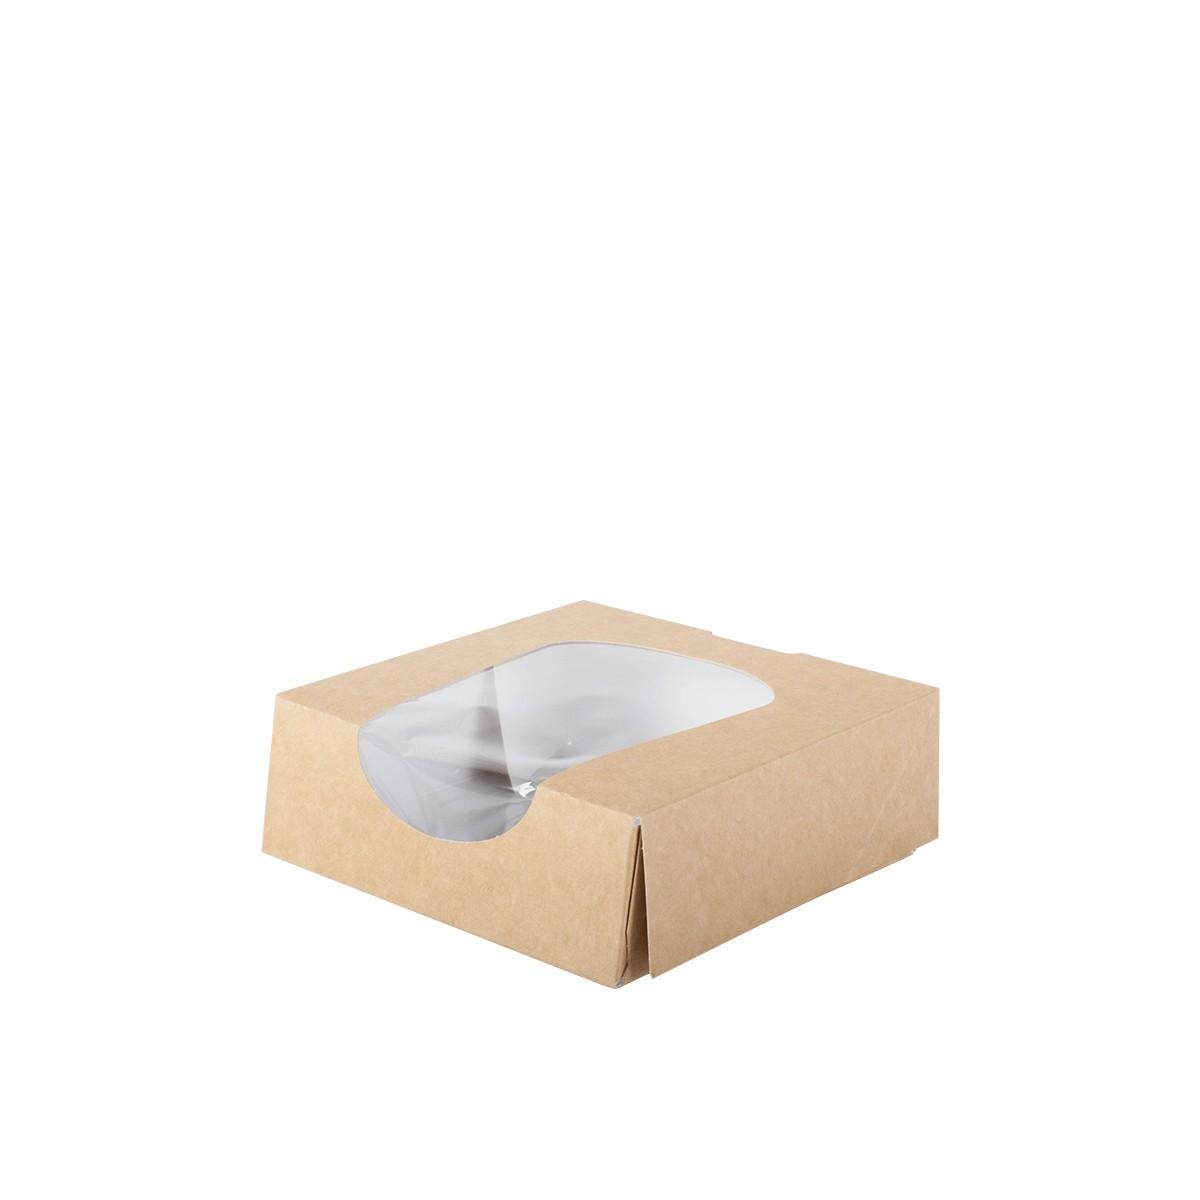 boite alimentaire carton avec fenetre vente a emporter